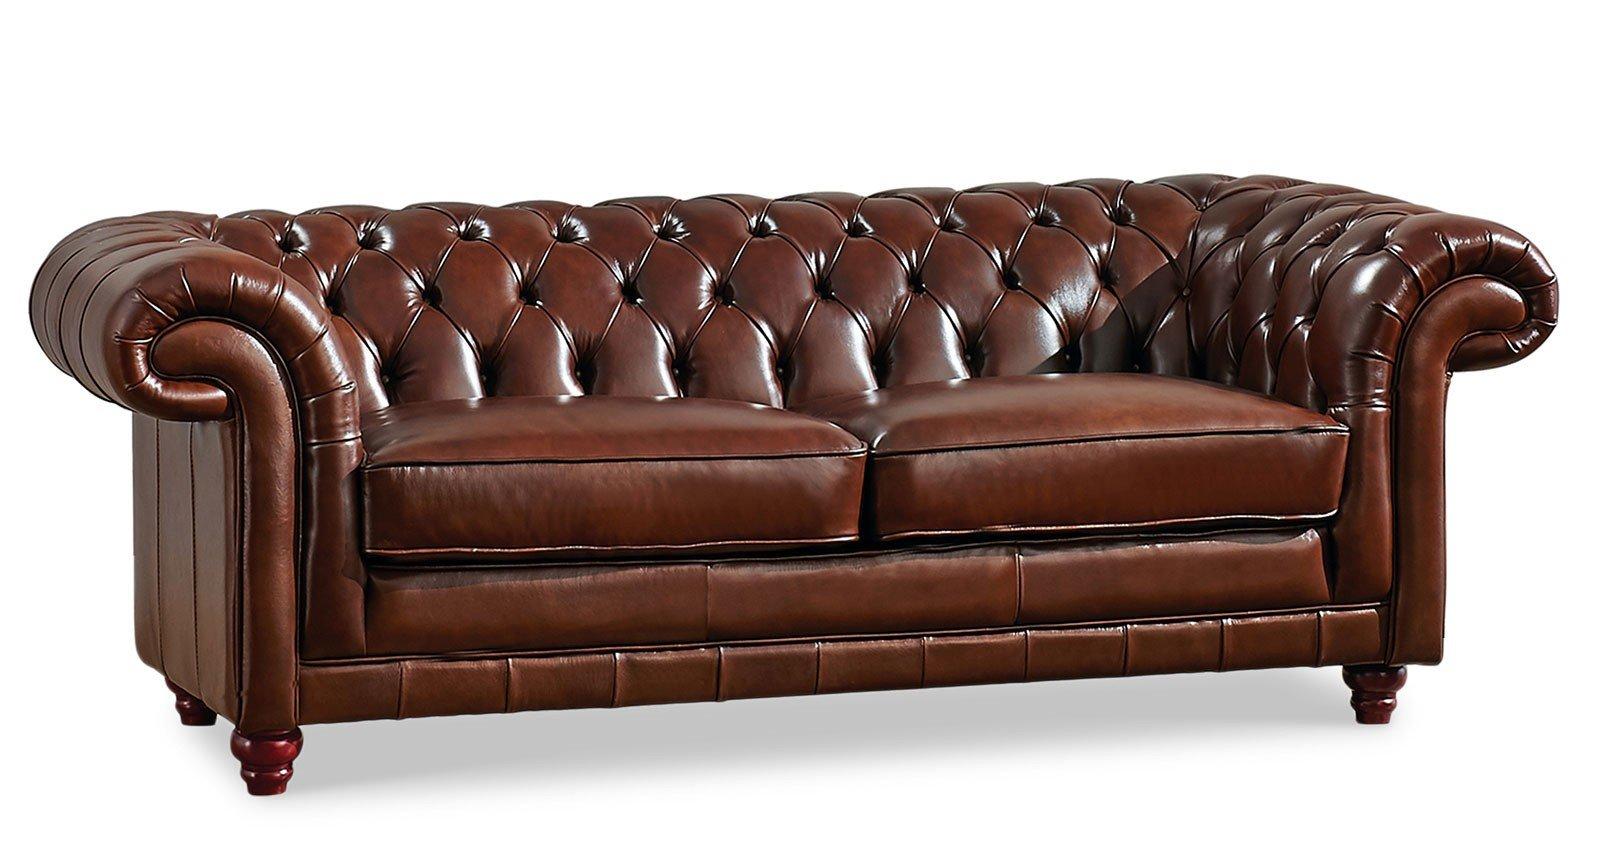 288 Tufted Brown Sofa Sofas Living Room Furniture